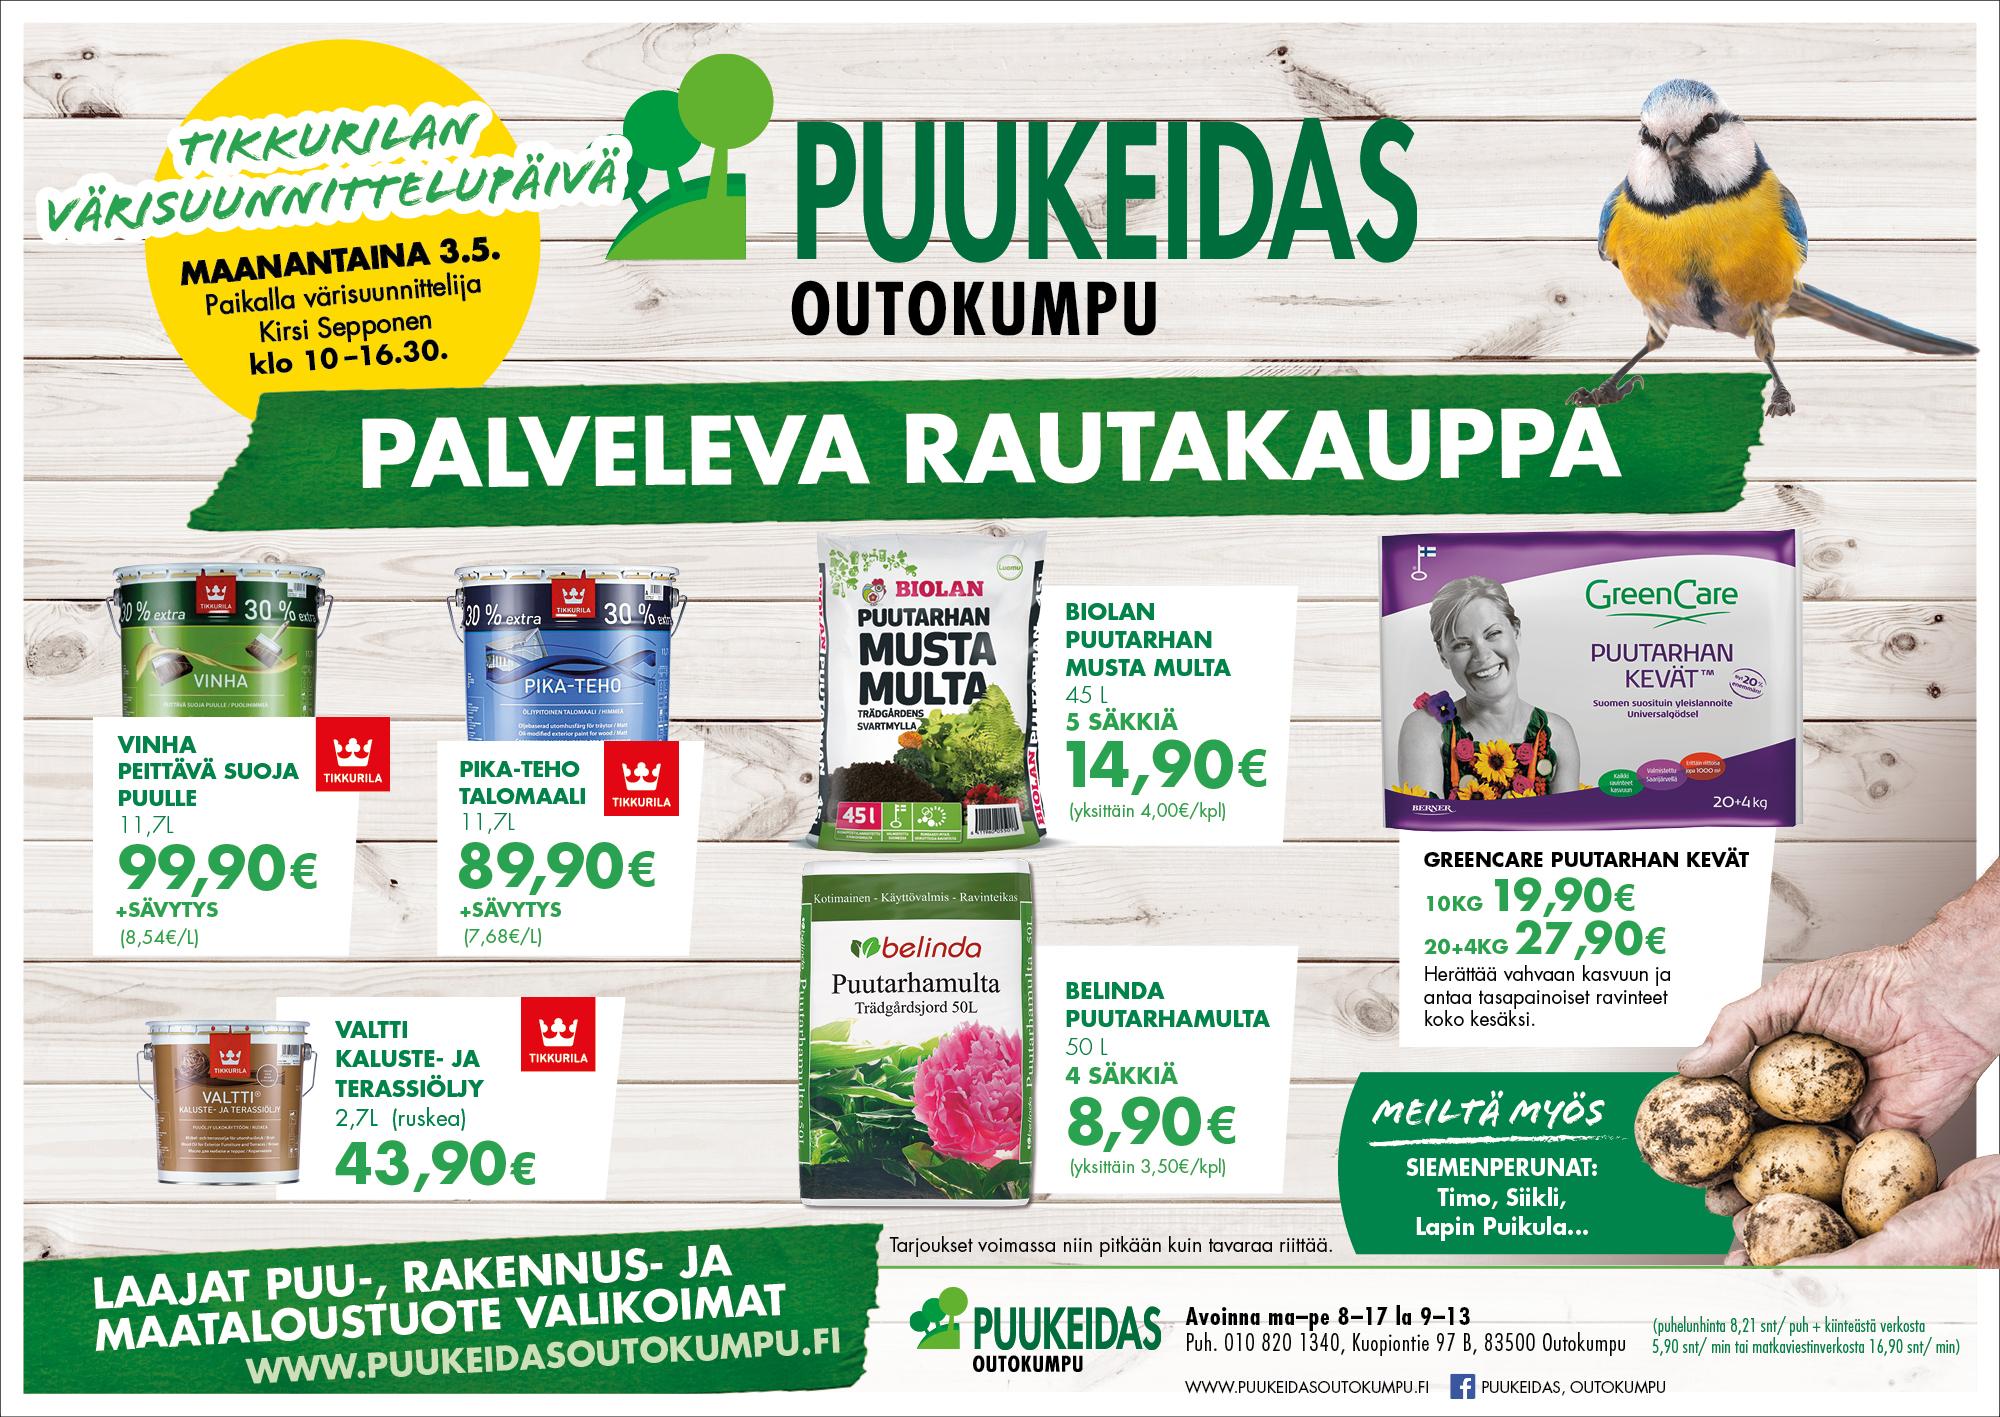 Puukeidas_tarjoukset-toukokuu2021